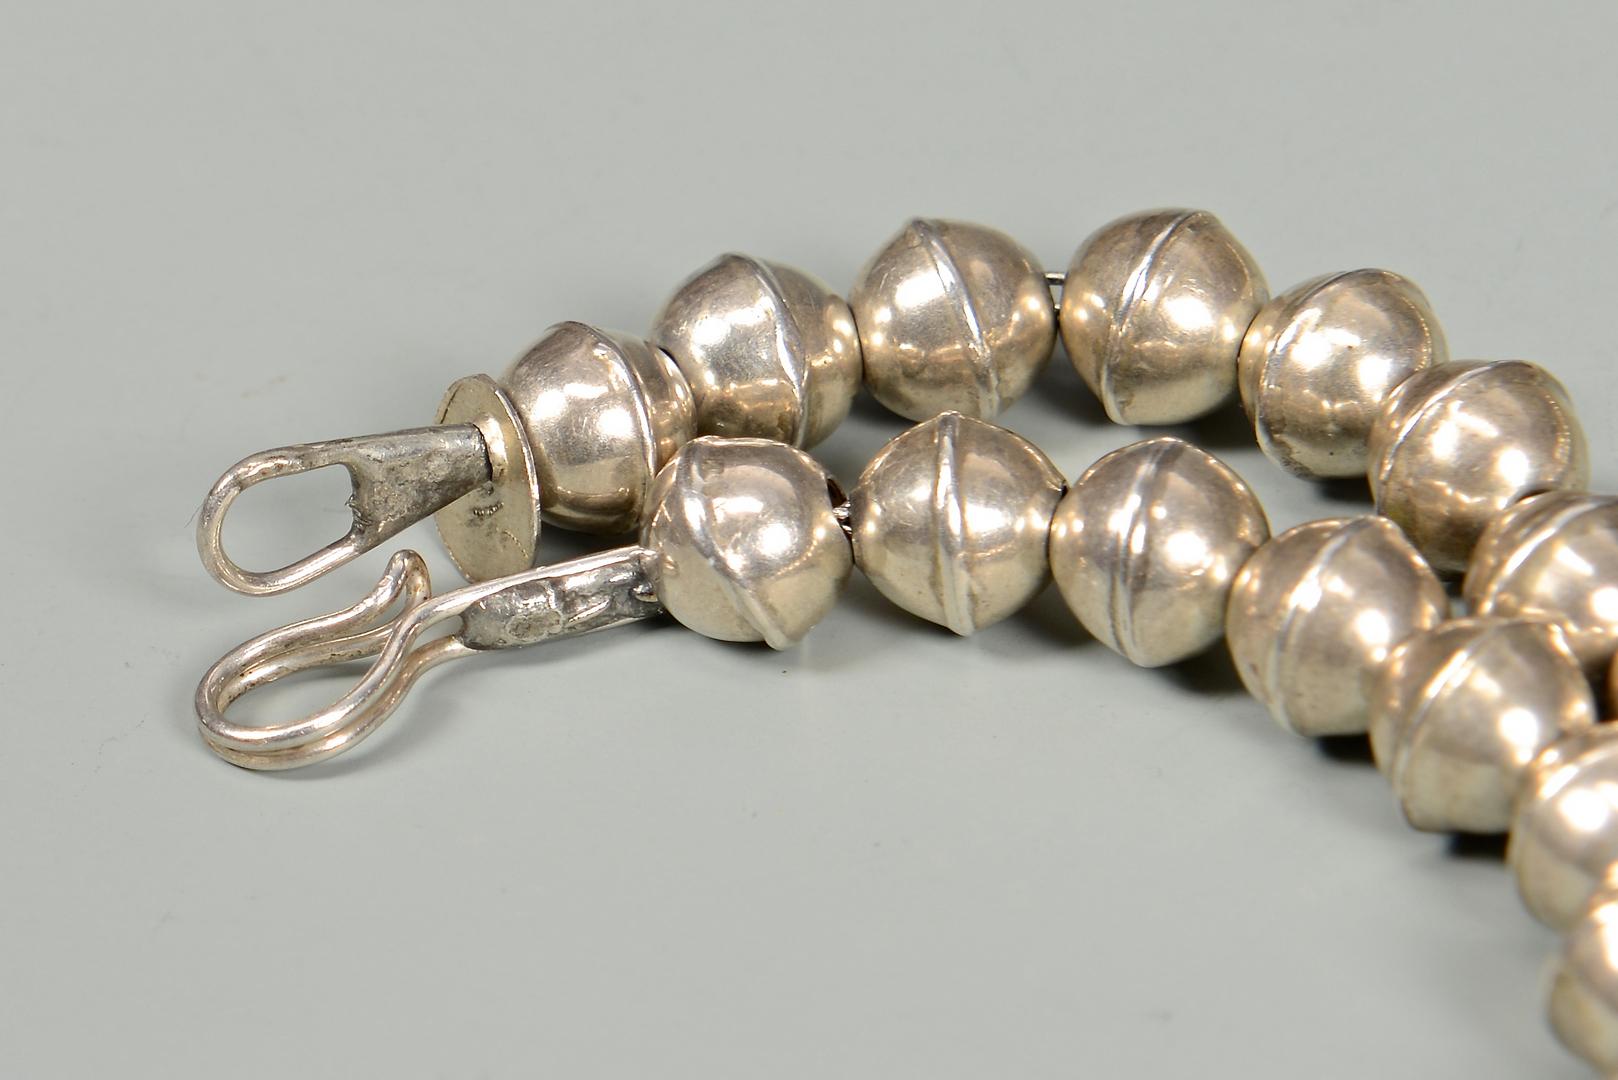 lot 637 handwrought navajo silver bead necklace